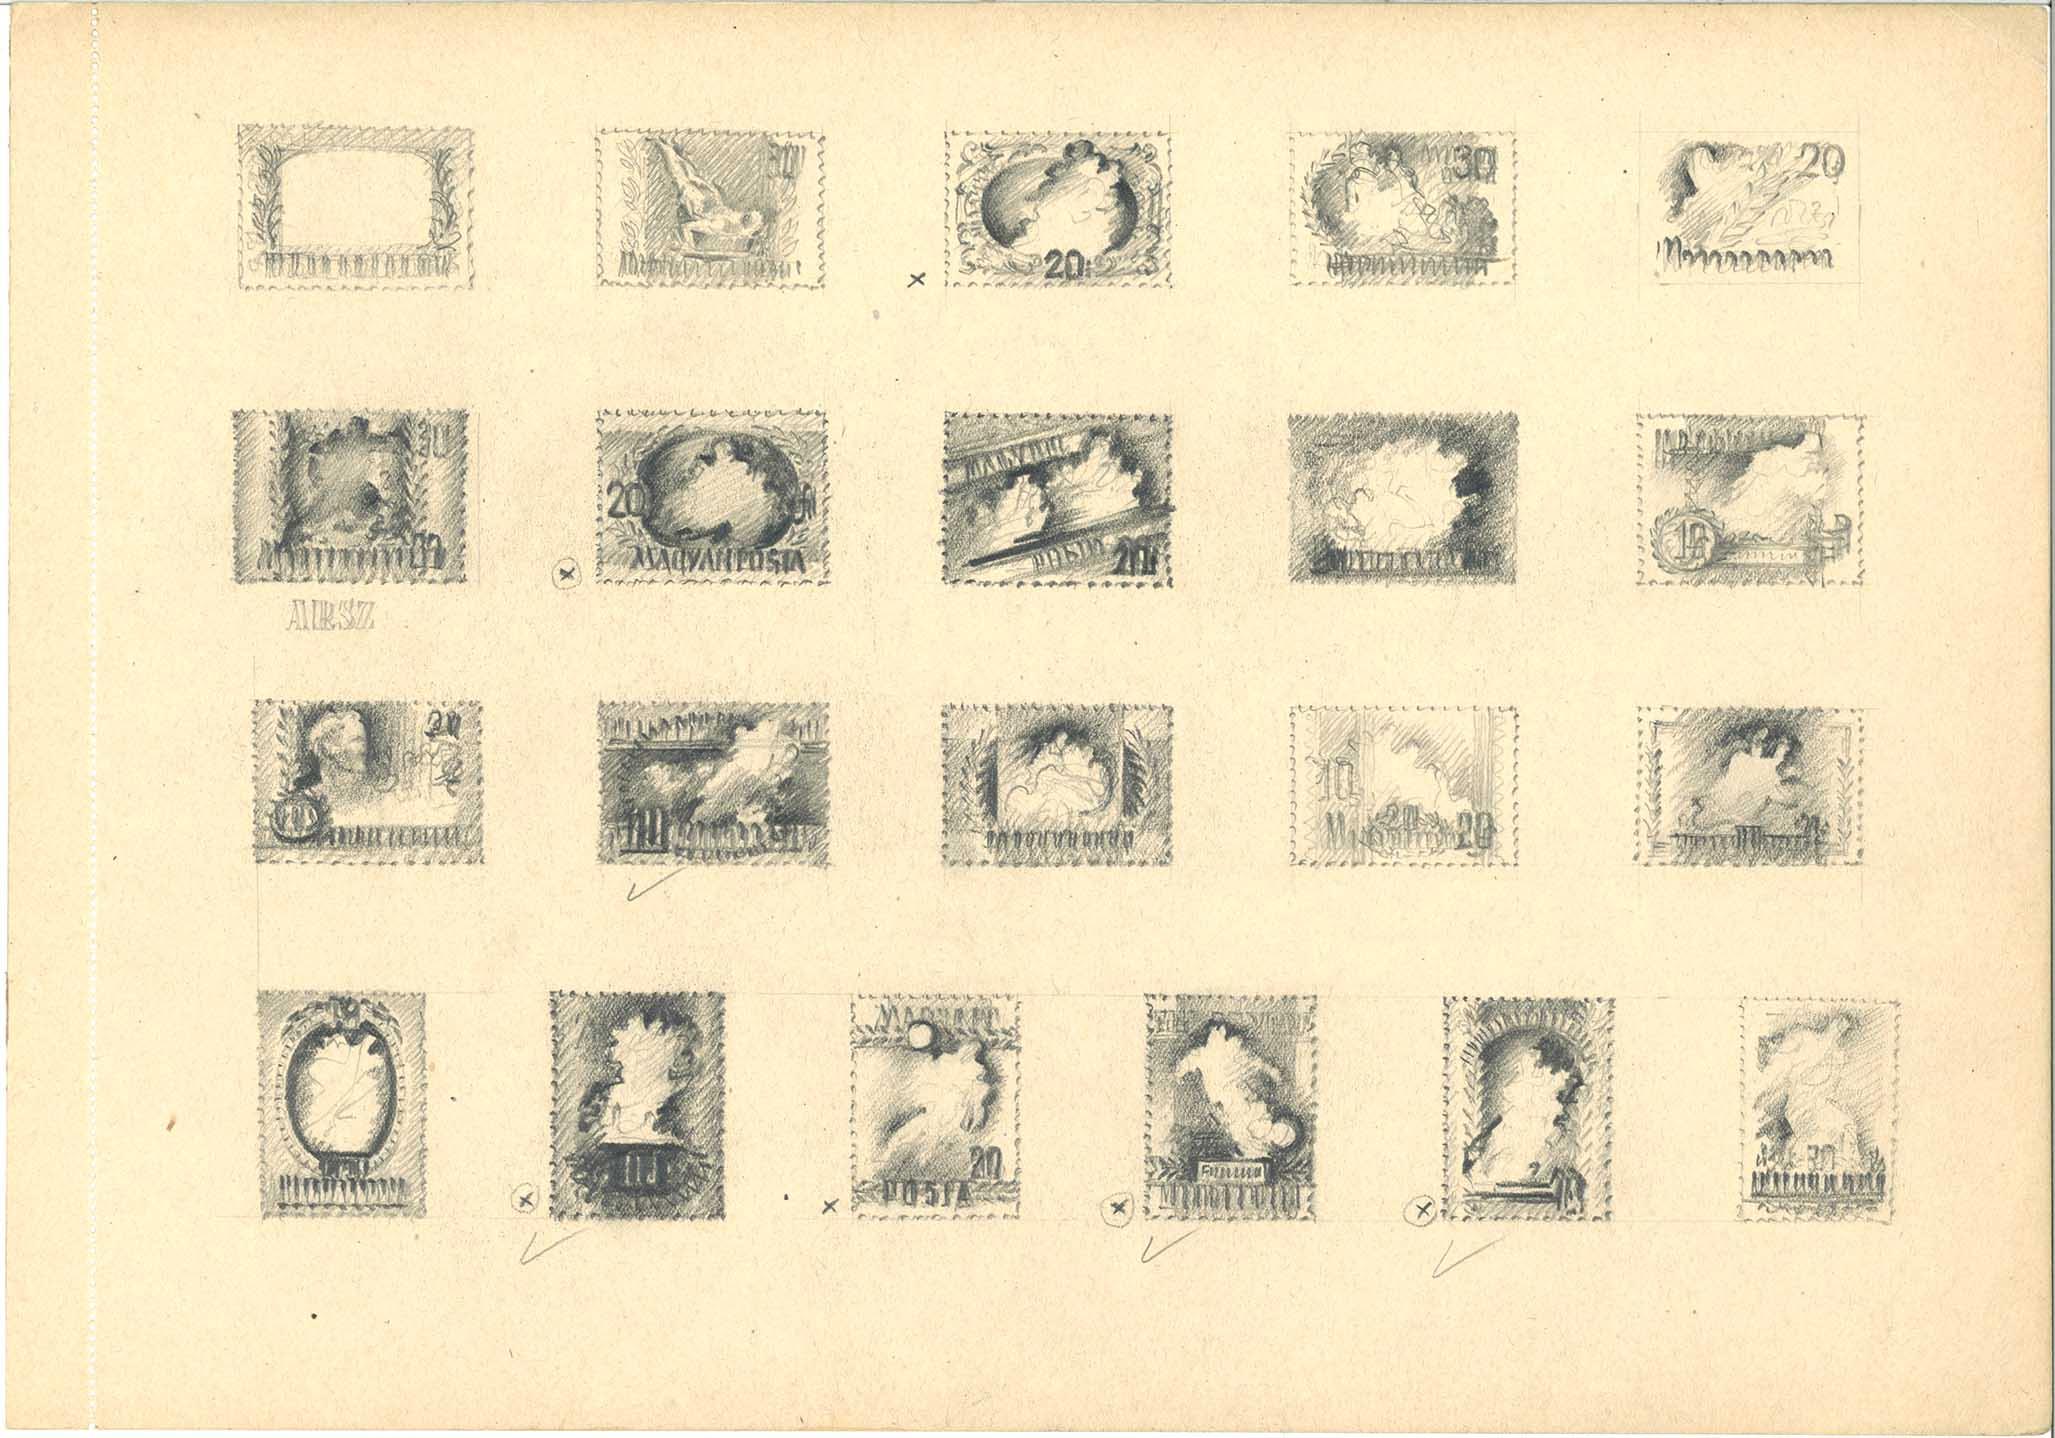 MAÏARSKO 1950 - Ideové návrhy maïarských športových známok